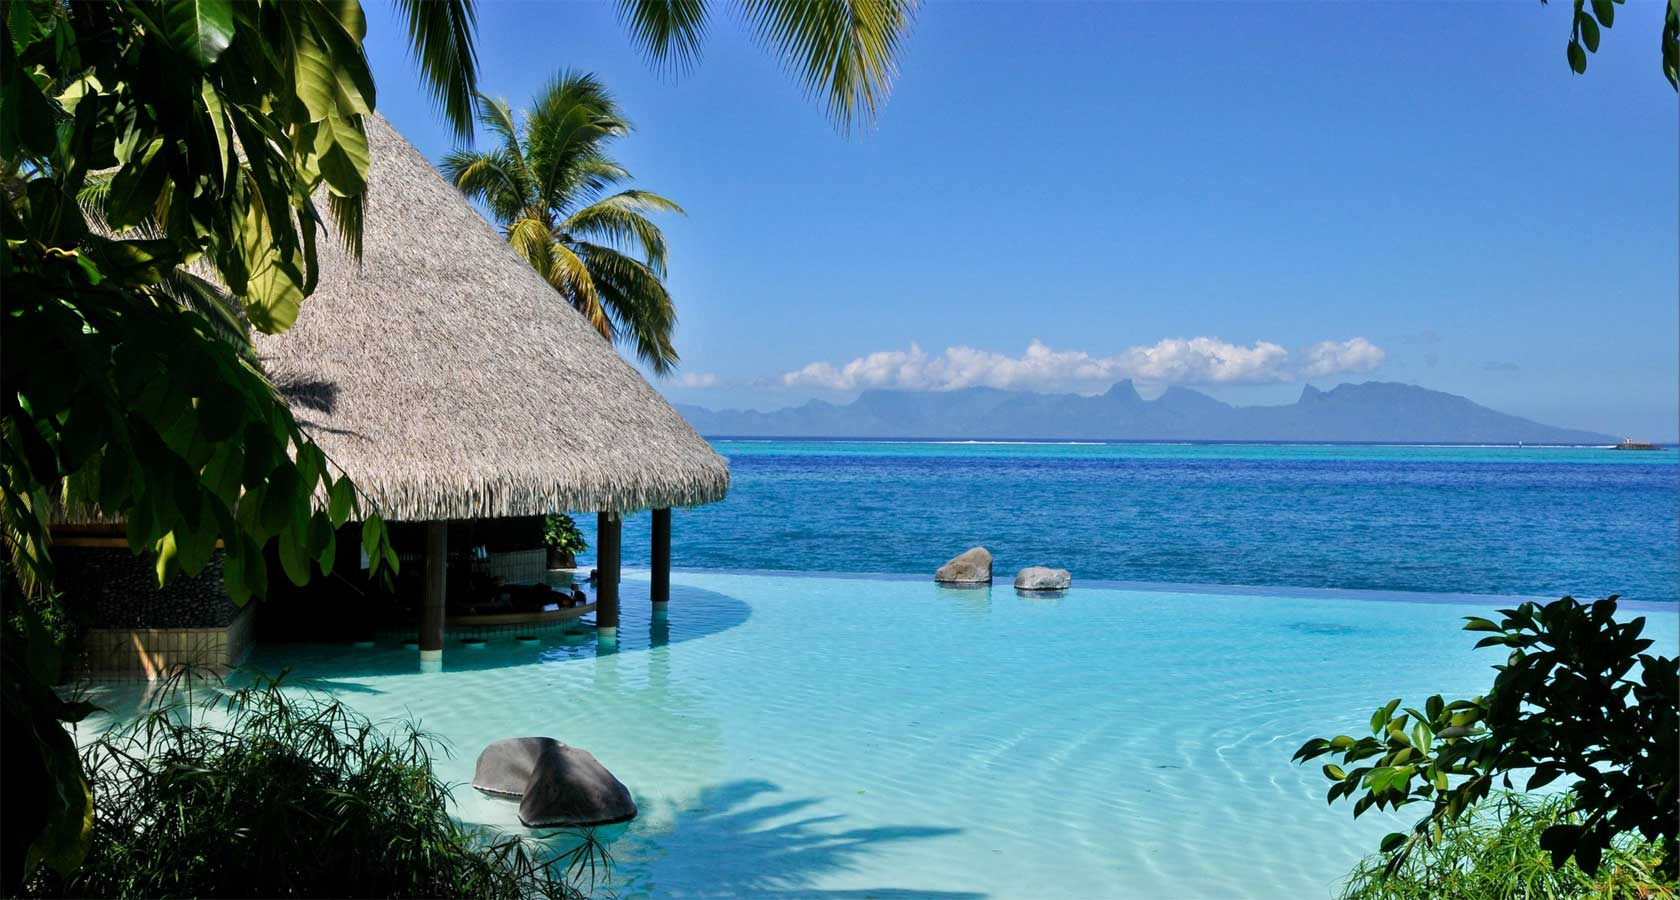 INTERCONTINENTAL RESORT TAHITI turquoise blue waters bar